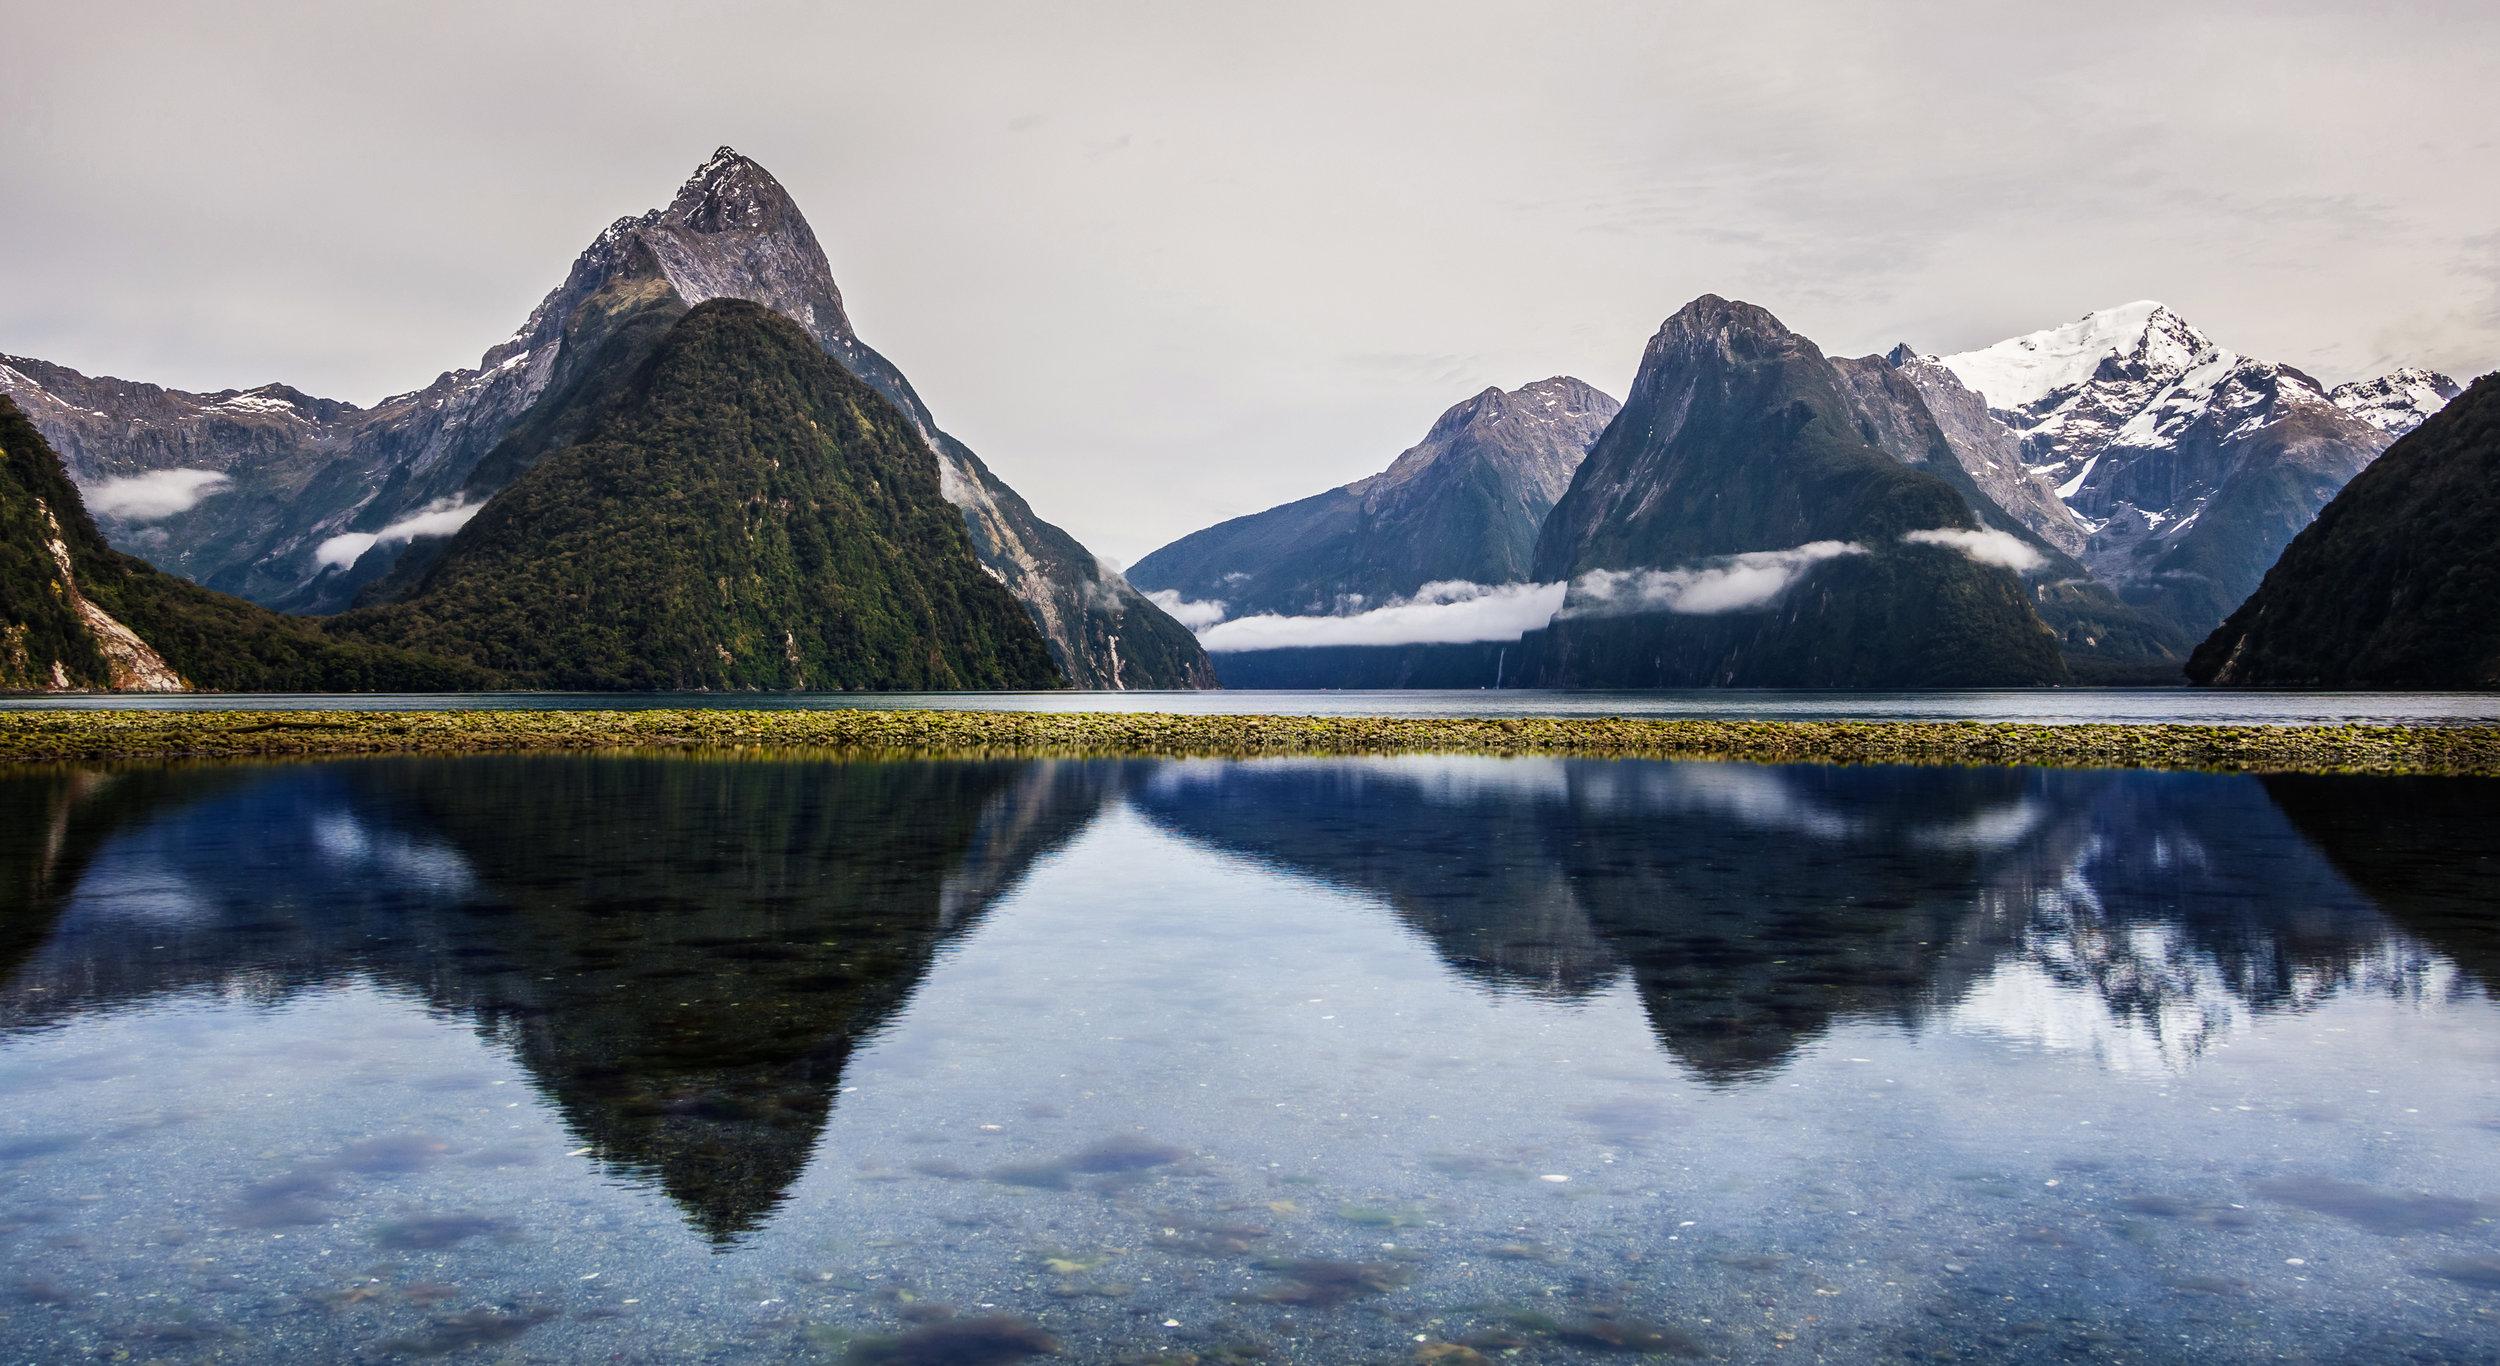 Milford Sound Morning Mist - New Zealand-4537 x 3161.jpg